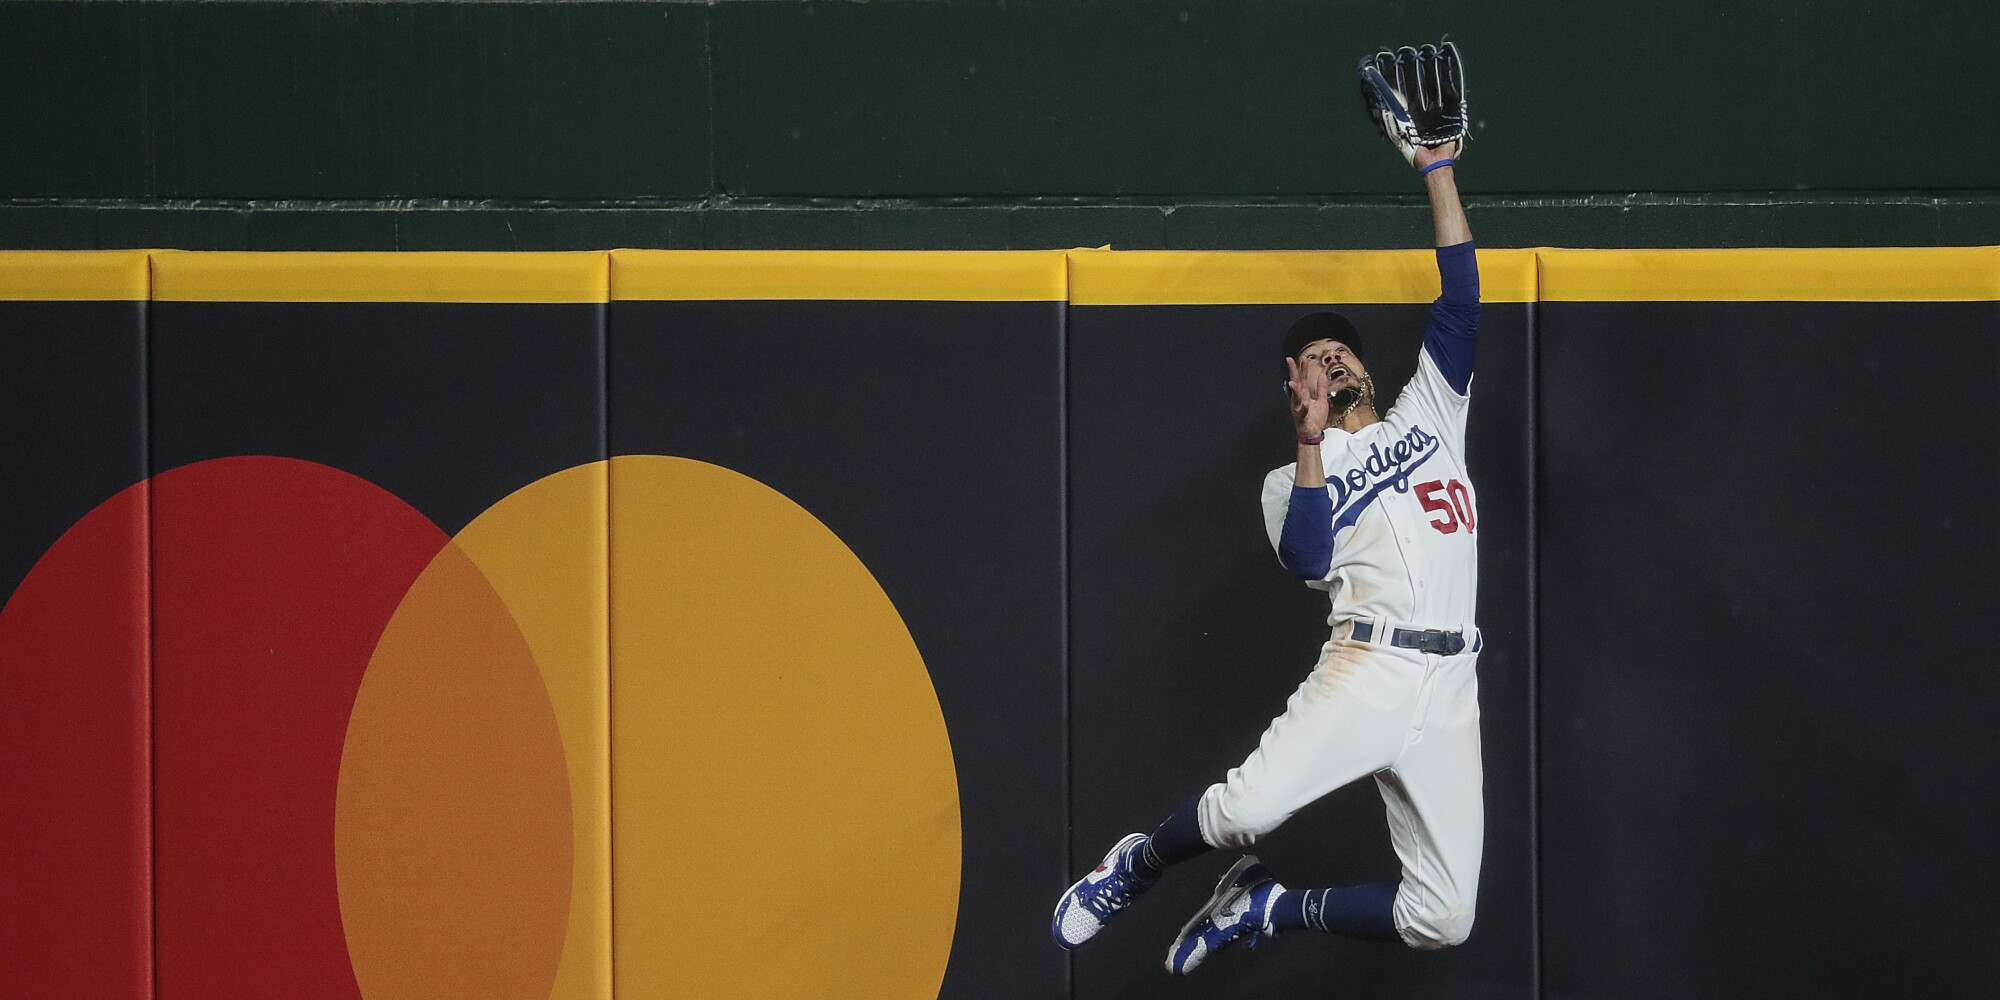 Dodgers right fielder Mookie Betts robs Atlanta Braves first baseman Freddie Freeman of a home run.